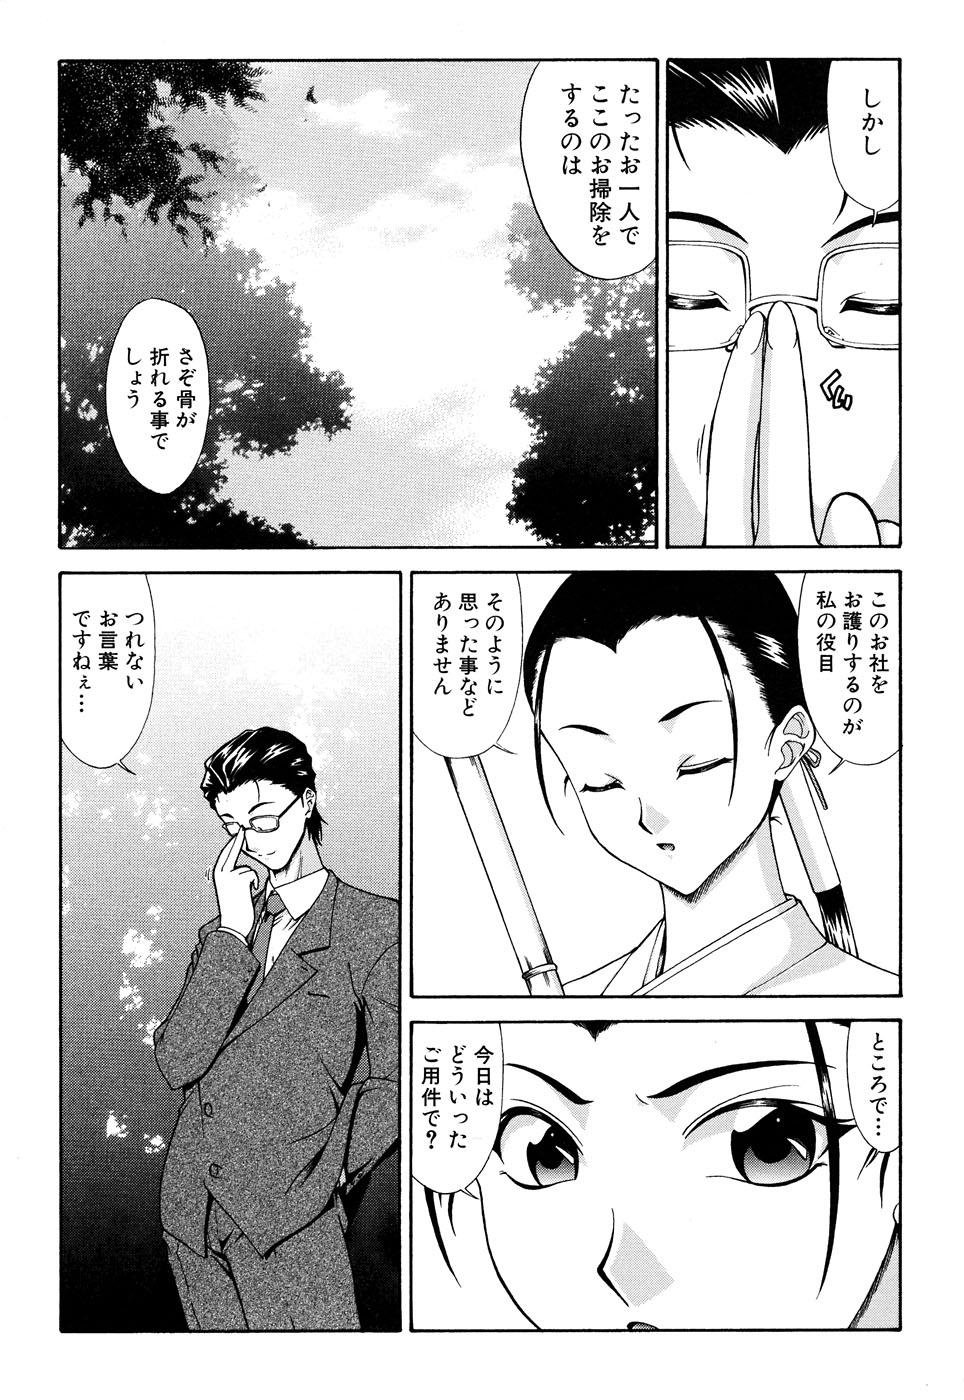 Fechikko VS Series ROUND.2 Miko San VS Maid San 11